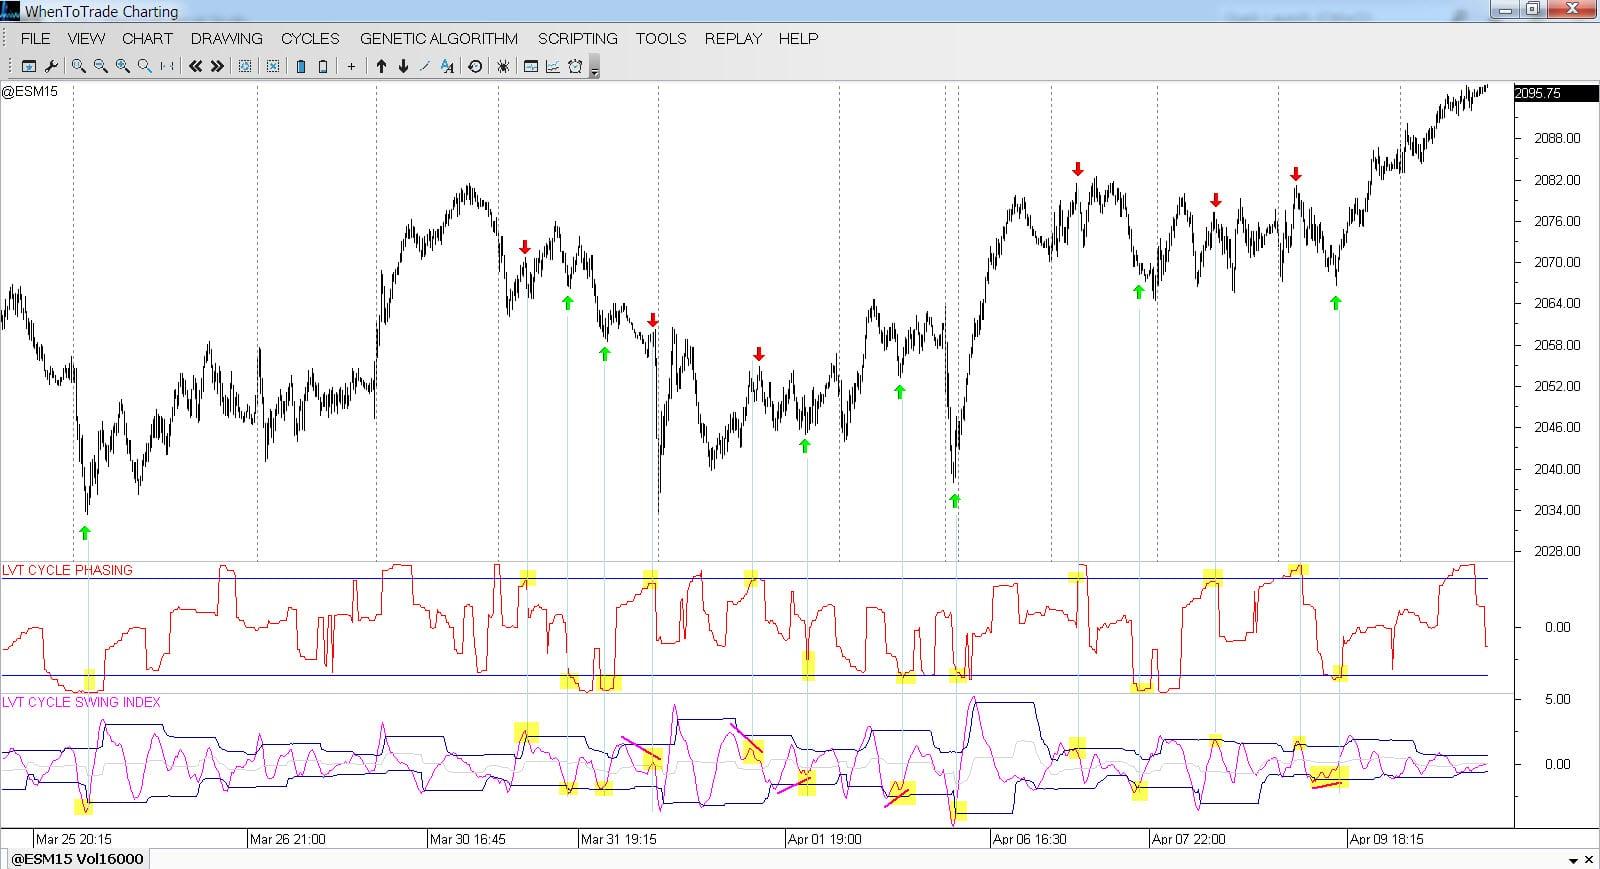 Cycle Phasing & Cycle Swing Indicator